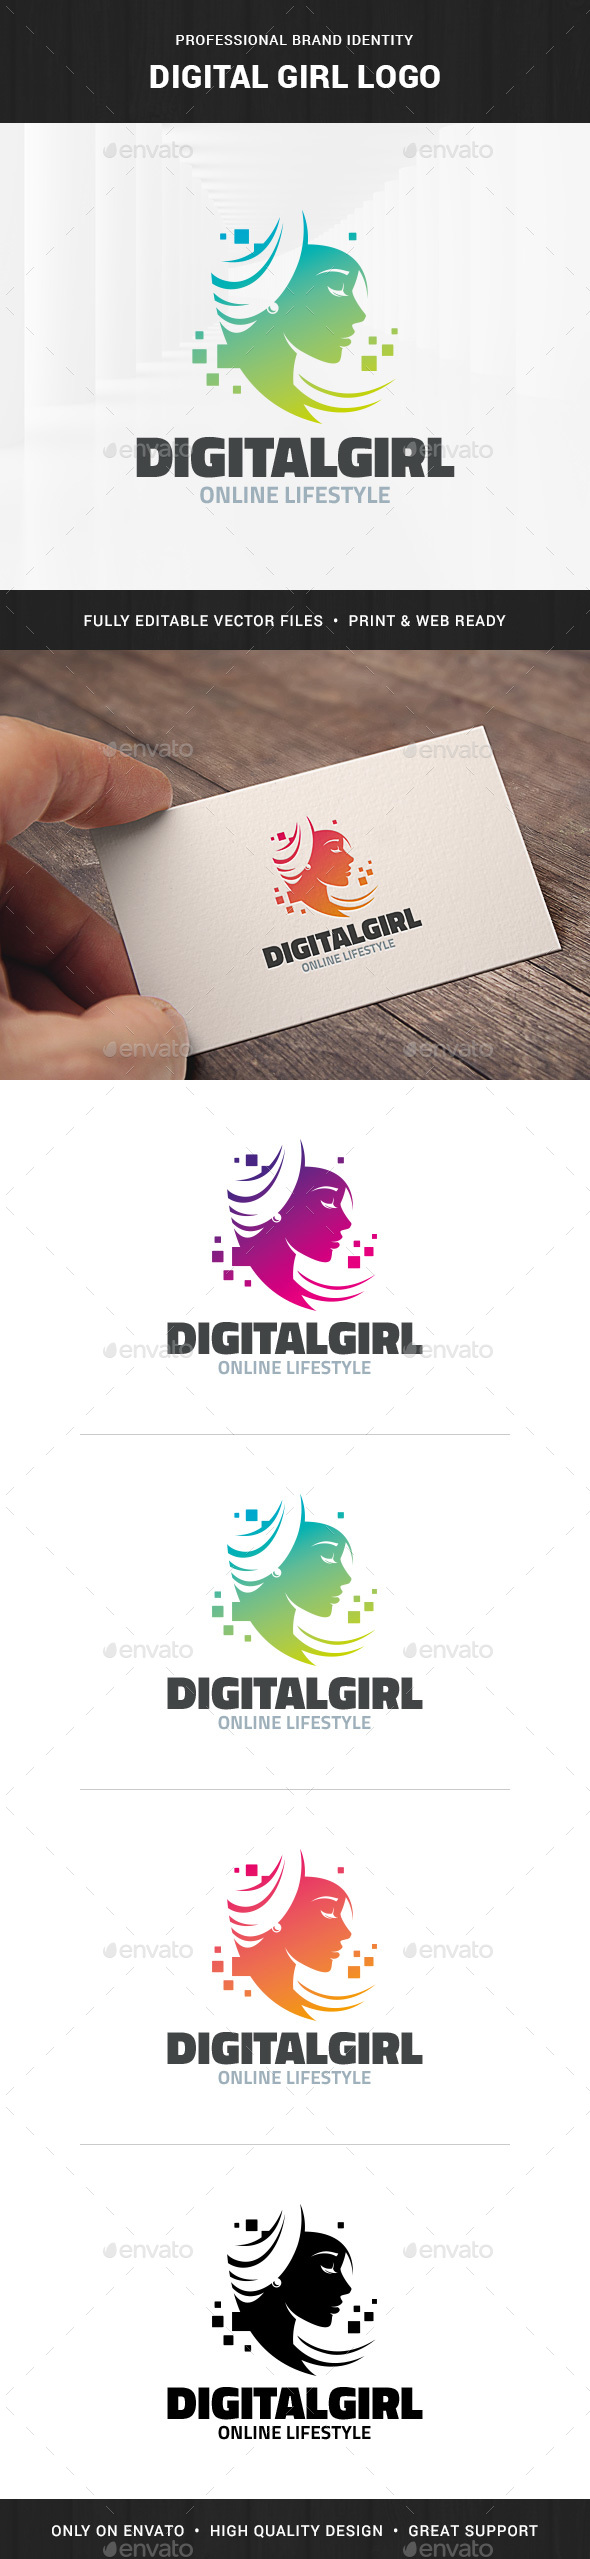 Digital Girl Logo Template